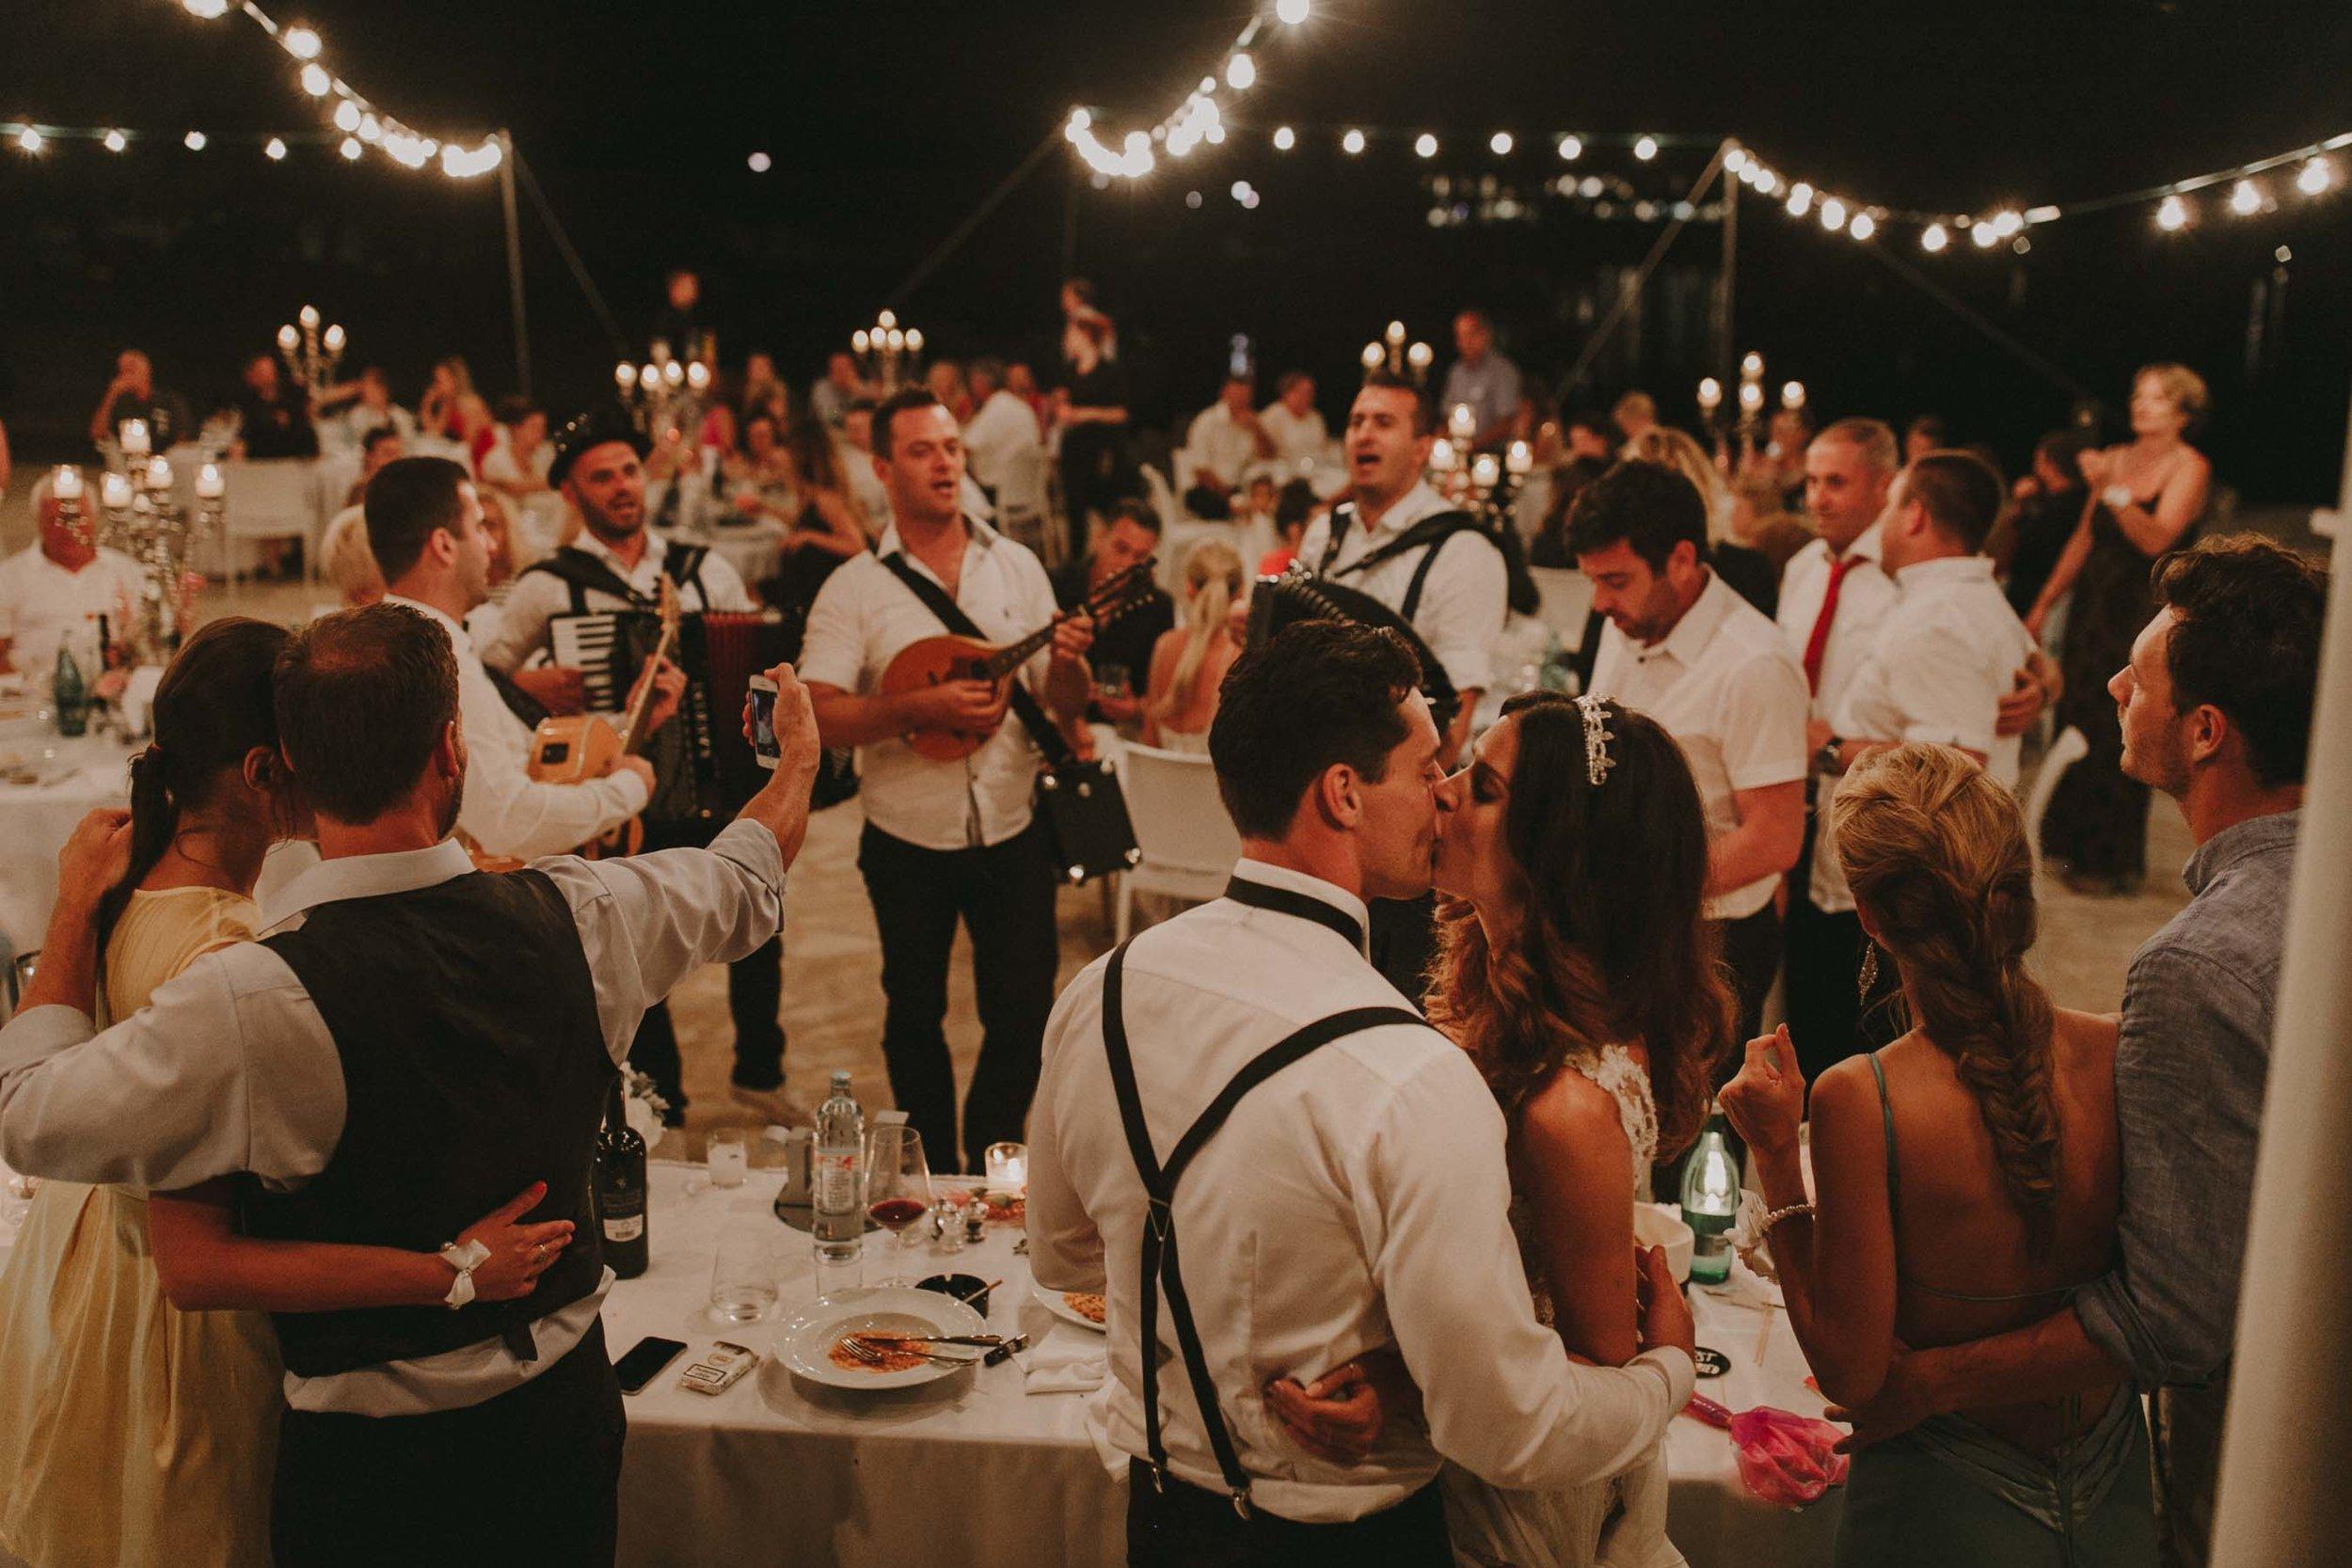 sylvia&dimitri-Wedding-Crvena_Luka-Croatia-115(6951).jpg